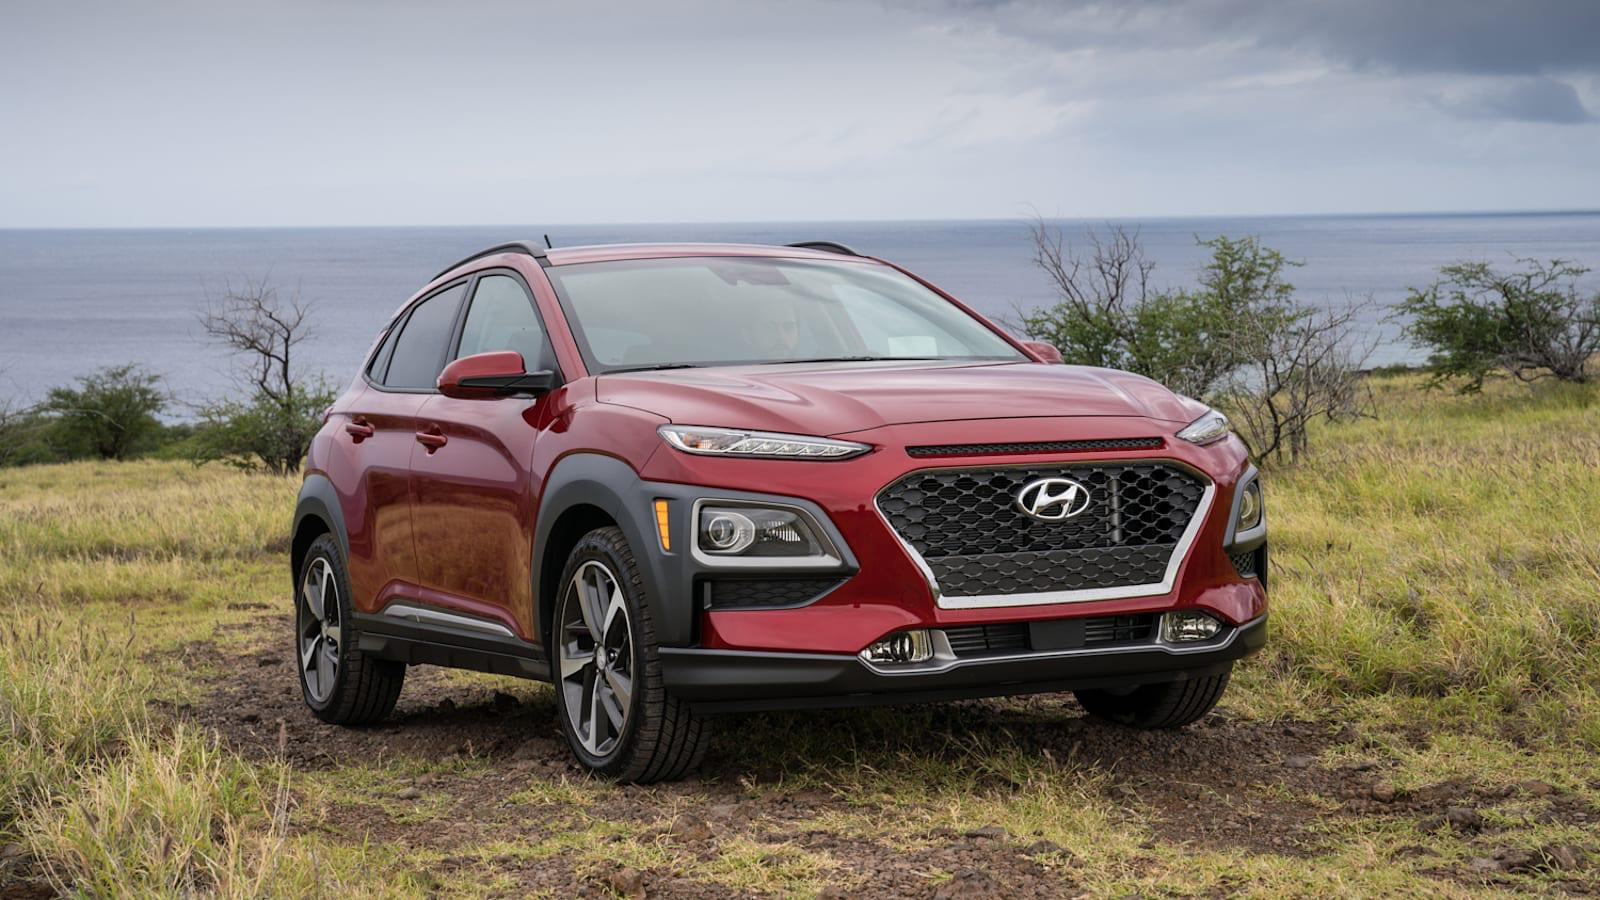 Here's How The Hyundai Kona And Bayon Compare